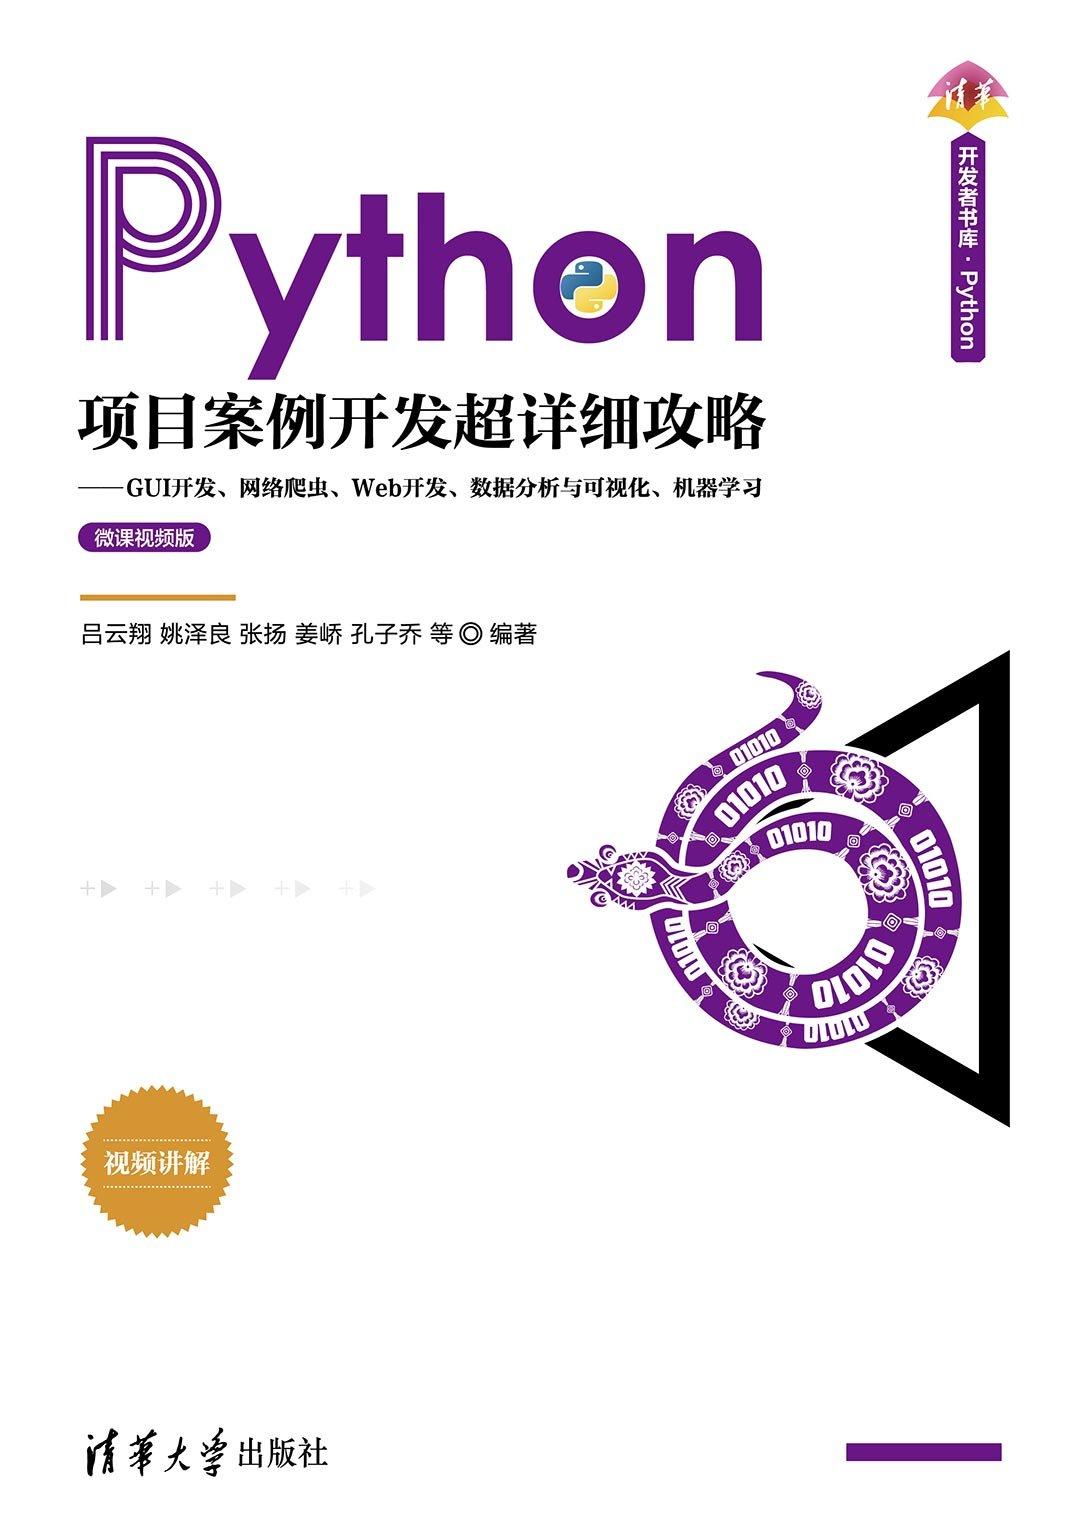 Python項目案例開發超詳細攻略——GUI開發、網絡爬蟲、Web開發、數據分析與可視化-preview-1